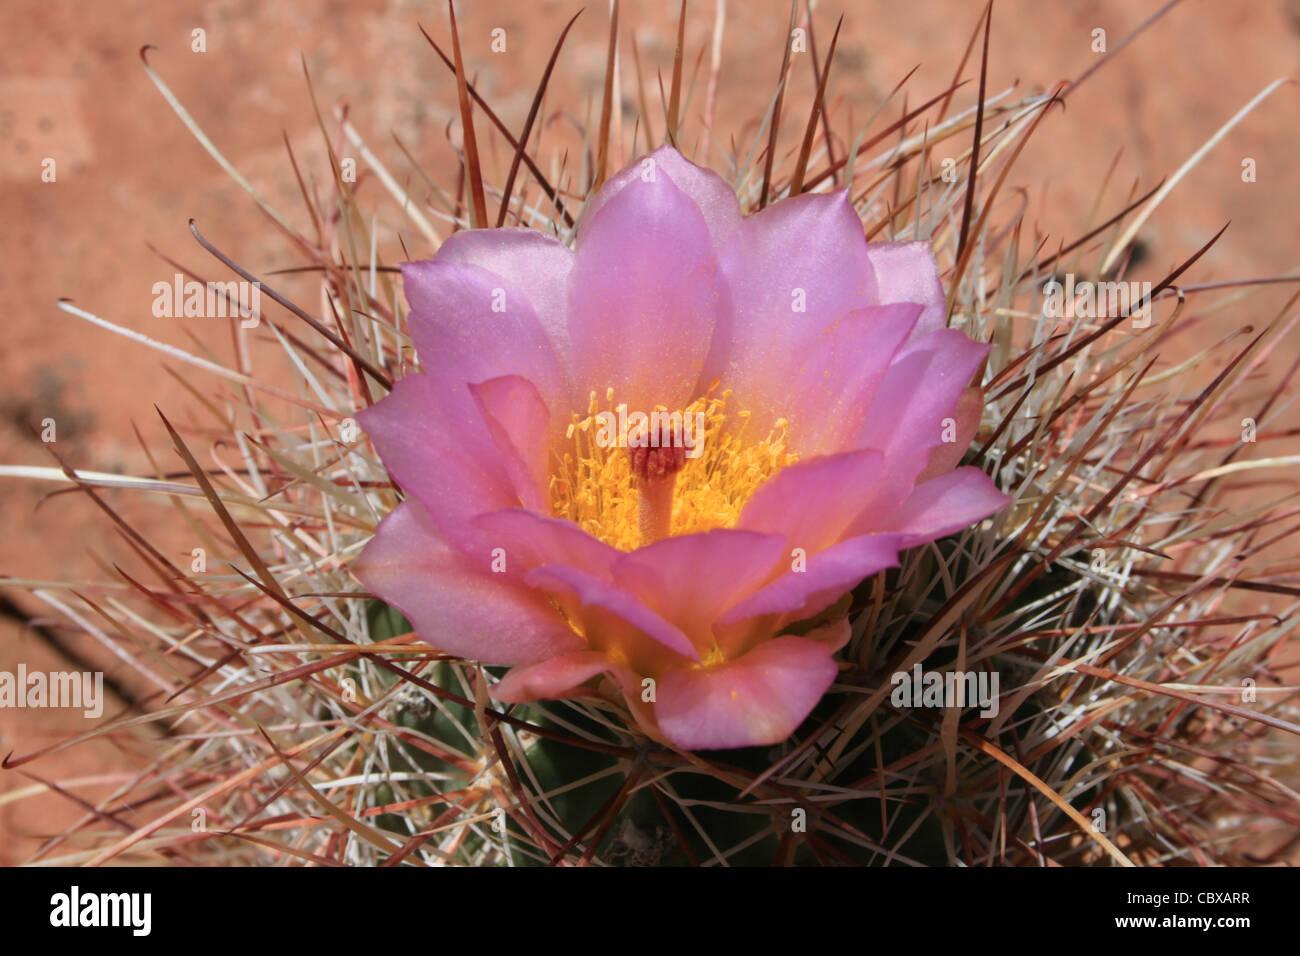 Cactus Flower Photos Cactus Flower Images Alamy